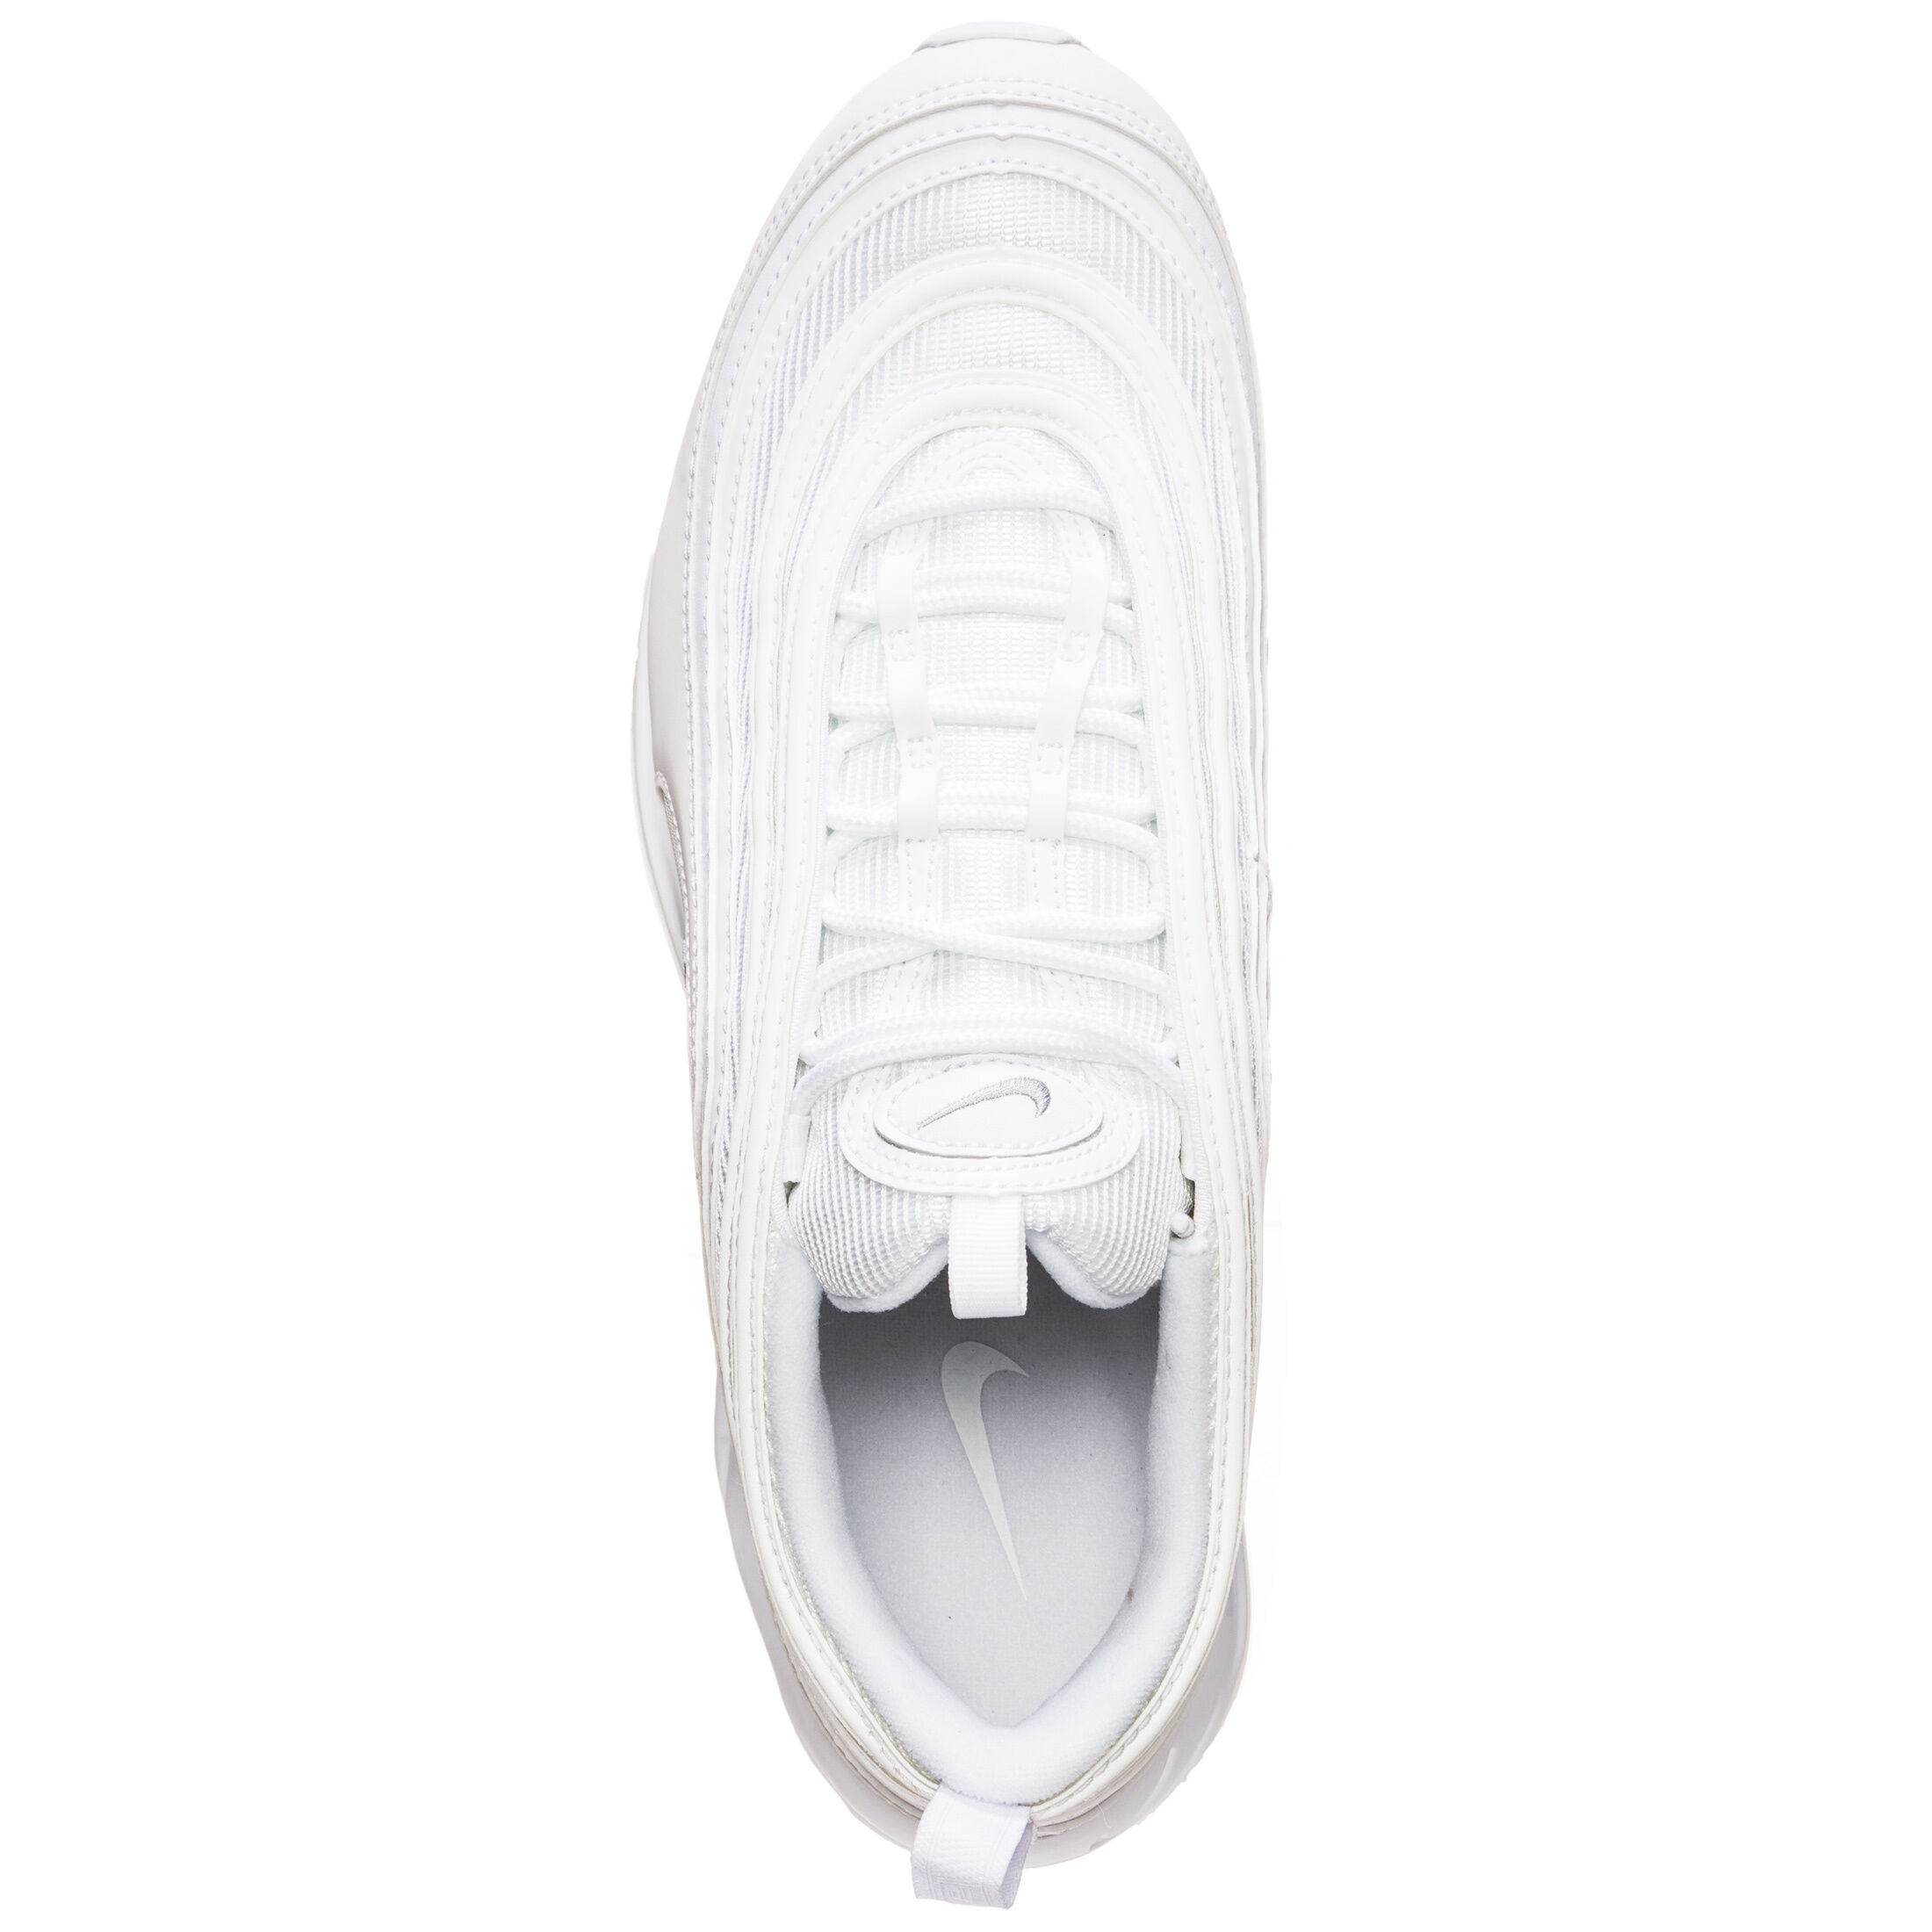 Nike Air Max 97 Ultra Light Sneaker Herren hellgrau weiß im